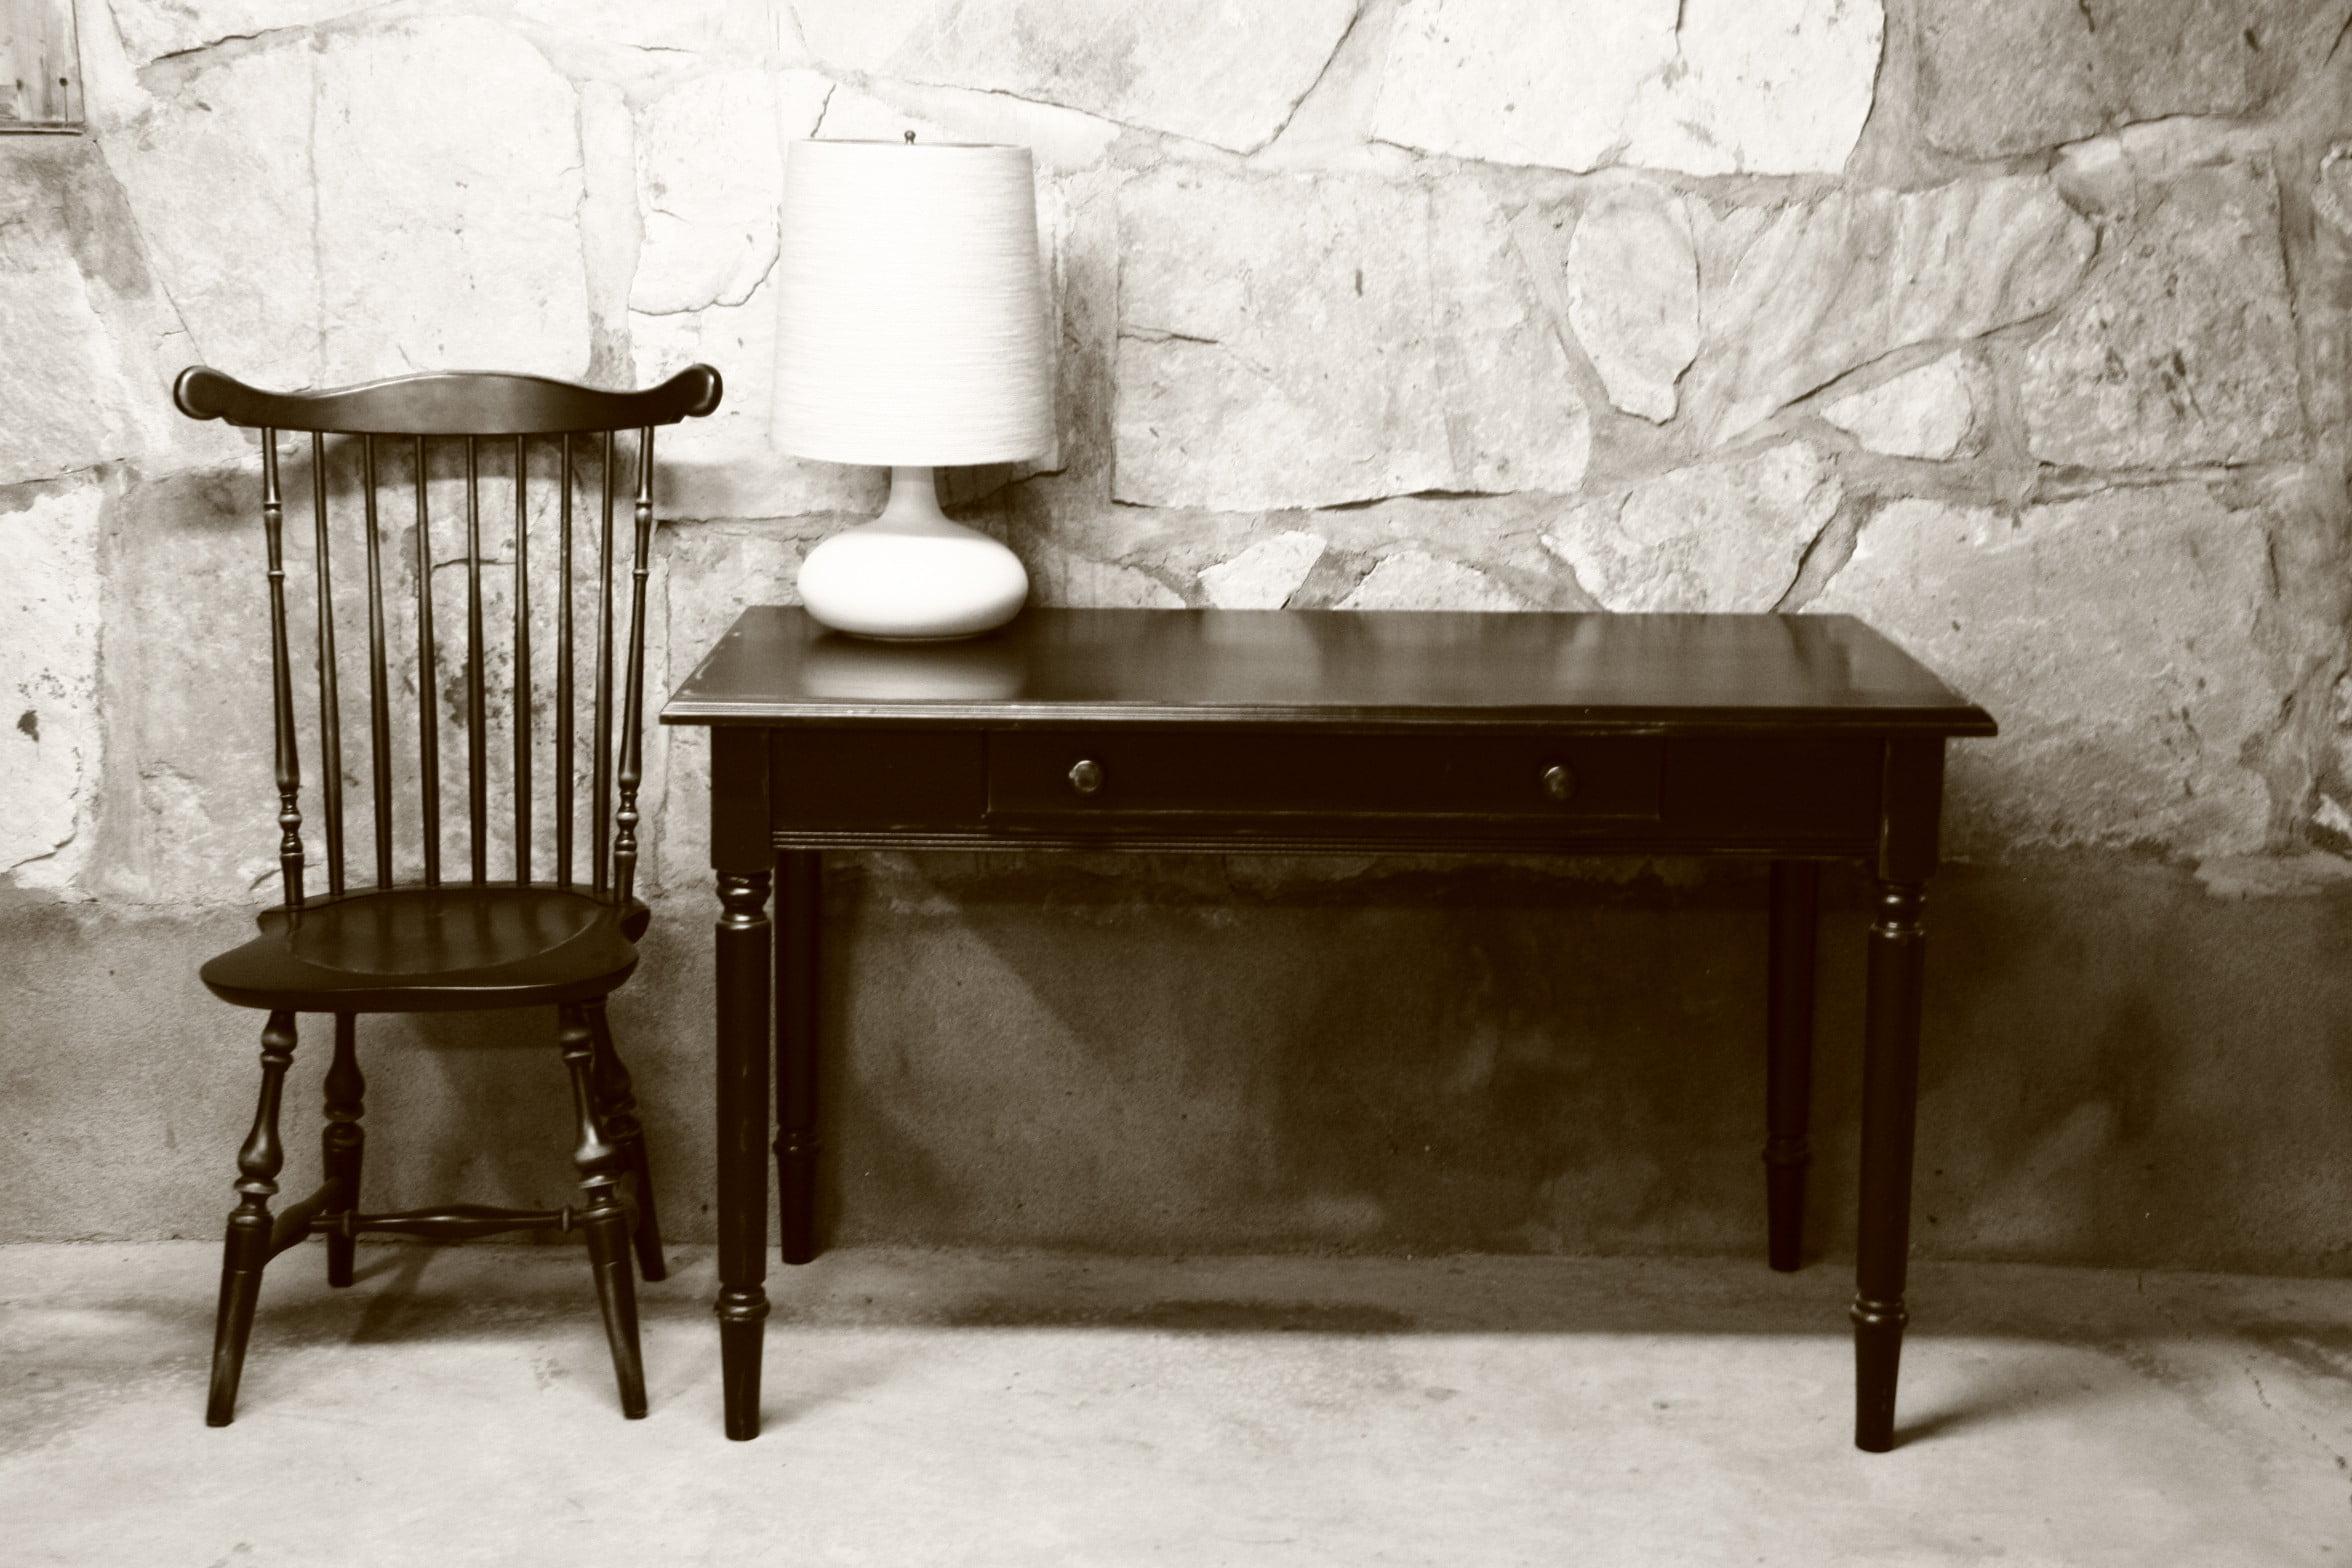 Pupitrefanback meubles sur mesure meubles hochelaga for Meuble hochelaga montreal